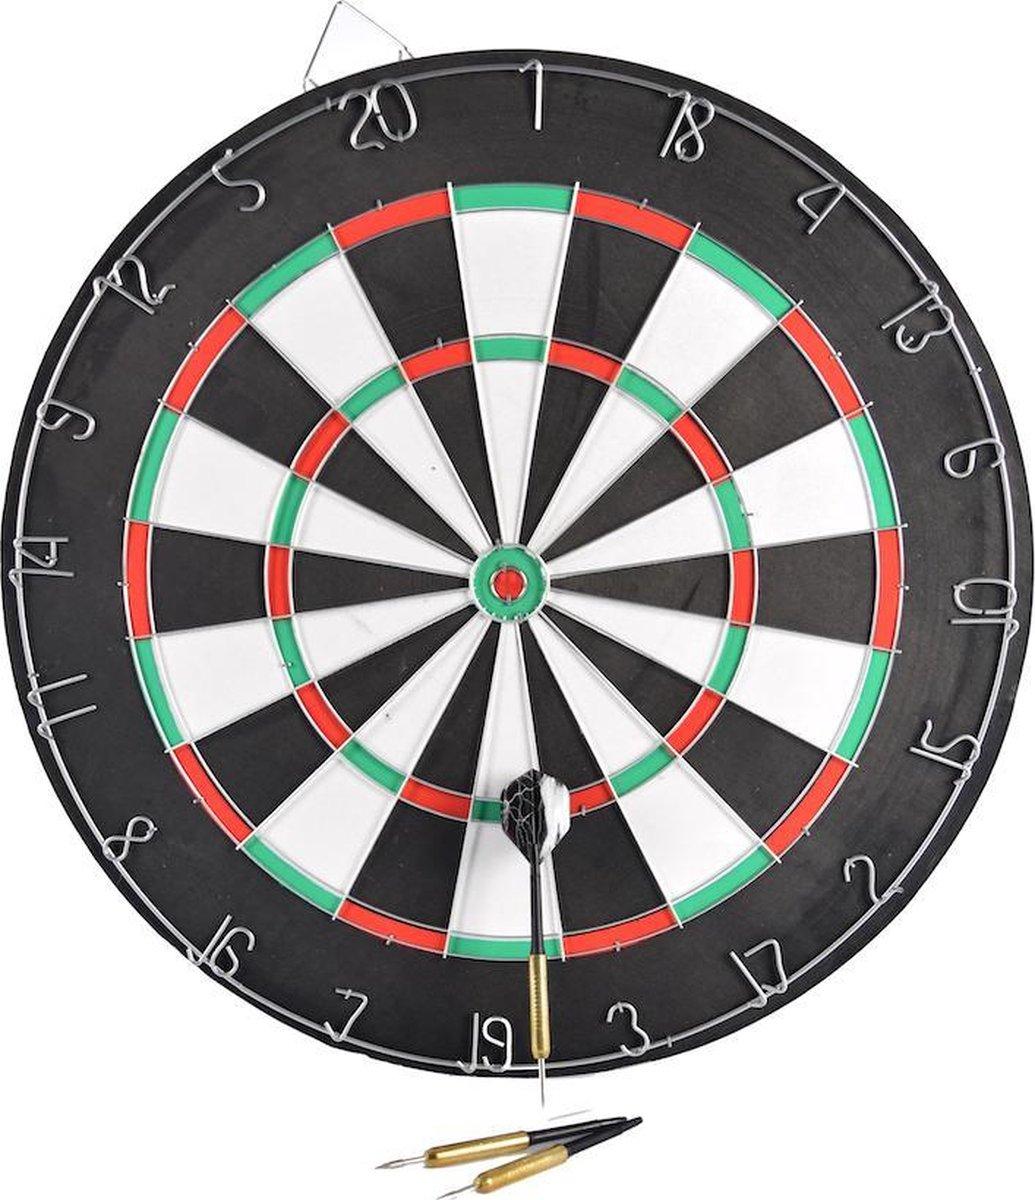 DartBord - incl. 6x Steeltip dartpijlen - Ø bord: 42cm dubbelzijdig speelbaar Steeldarts